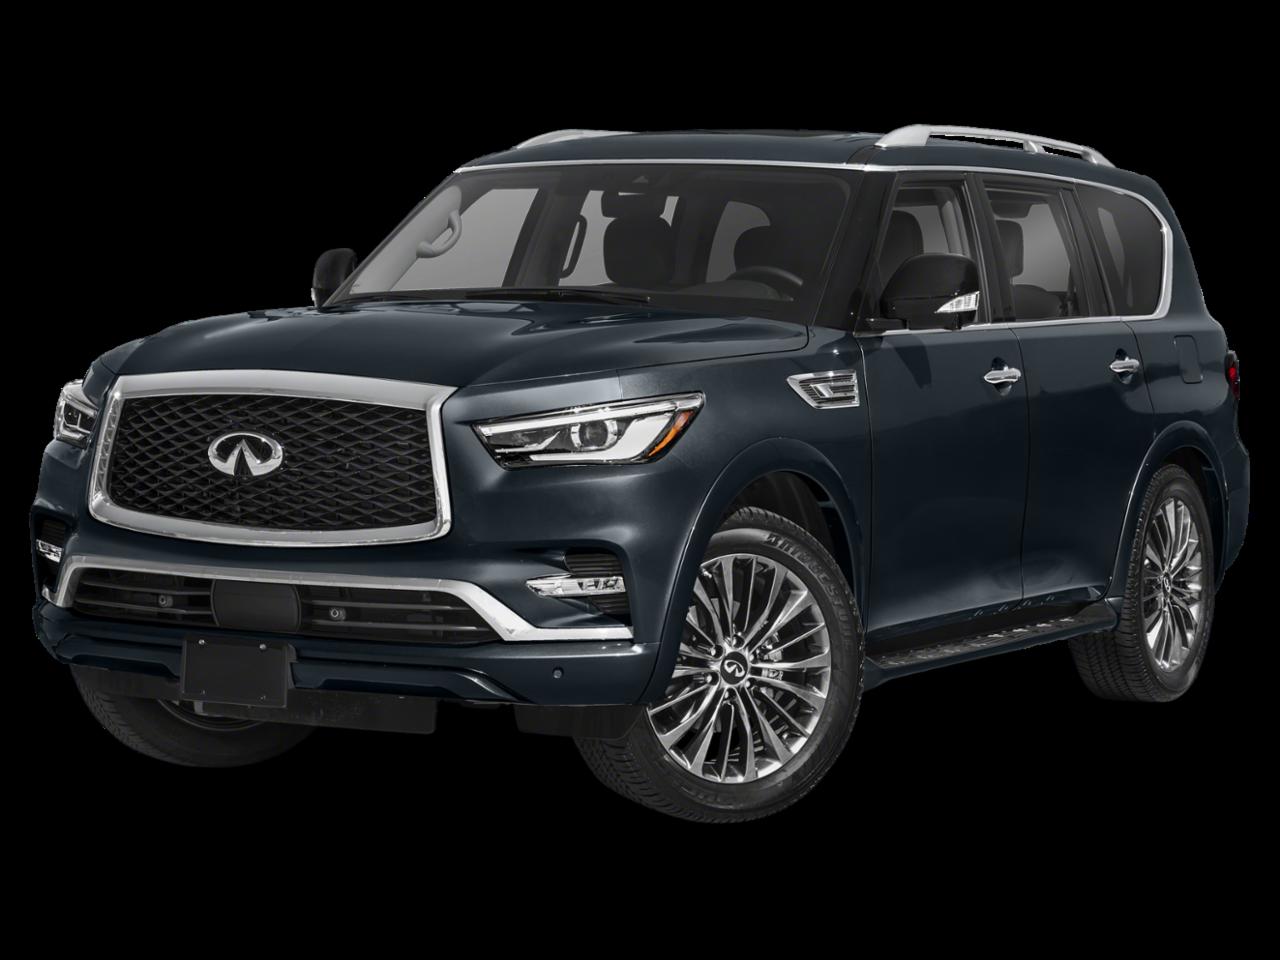 INFINITI 2021 QX80 LUXE 4WD